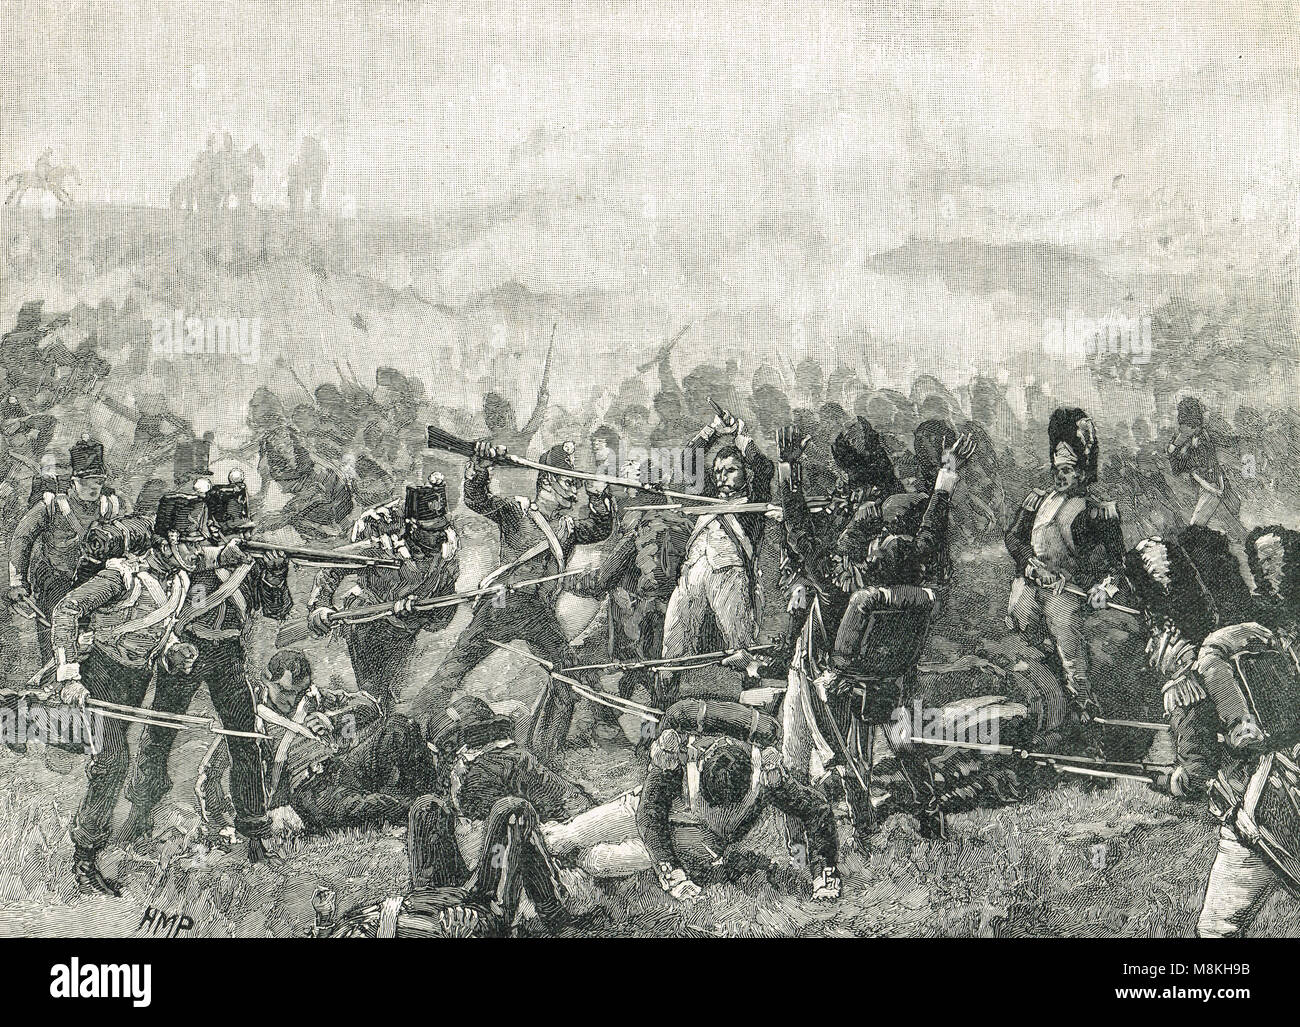 The Battle of Waterloo, 18 June 1815 - Stock Image